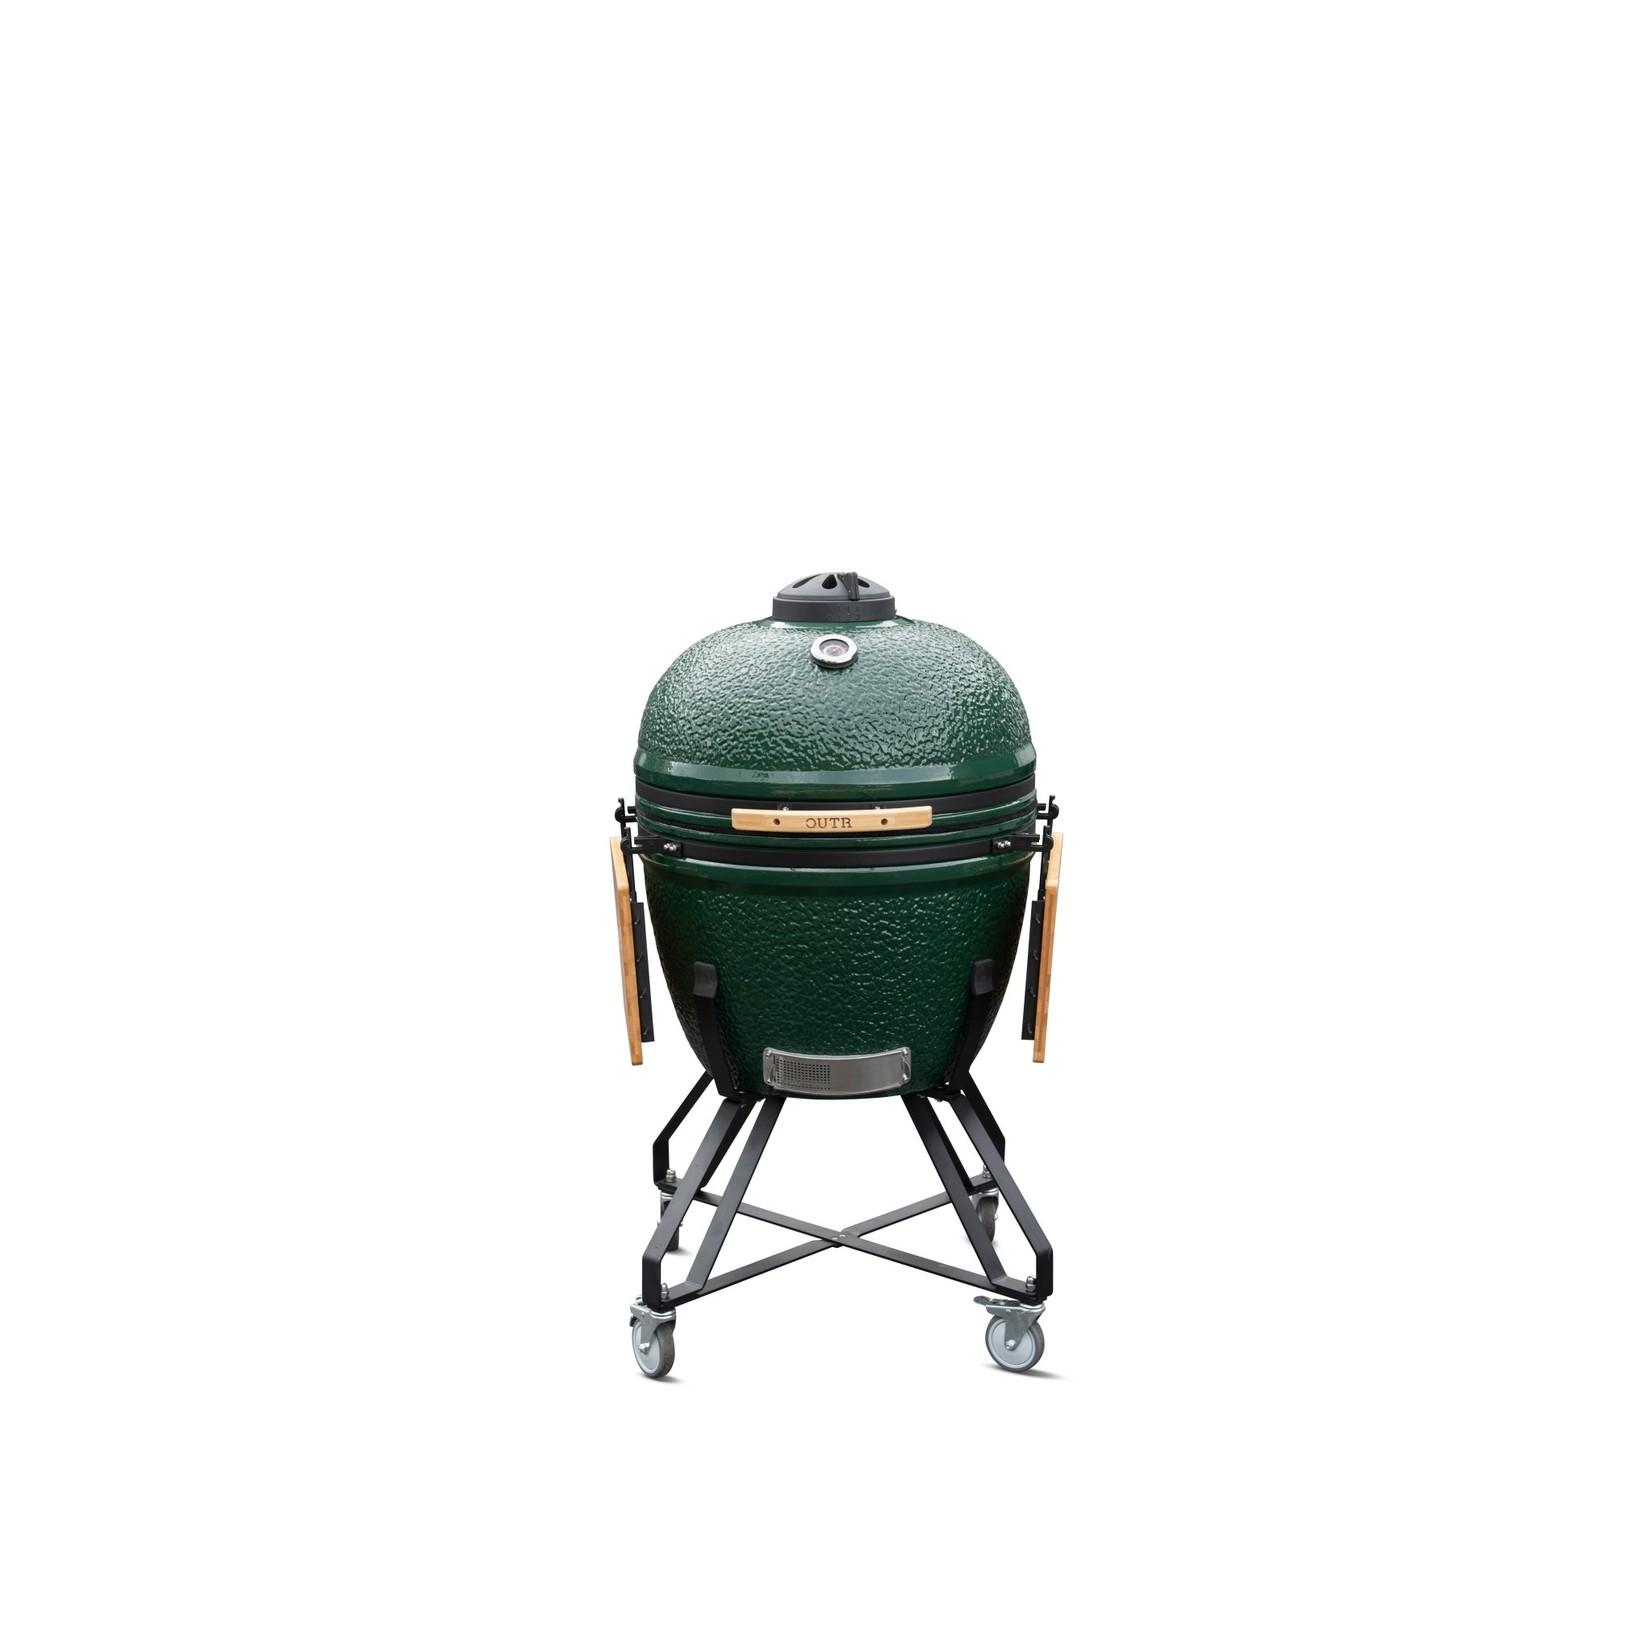 Outr Outr kamado grill XXLarge 70 groen